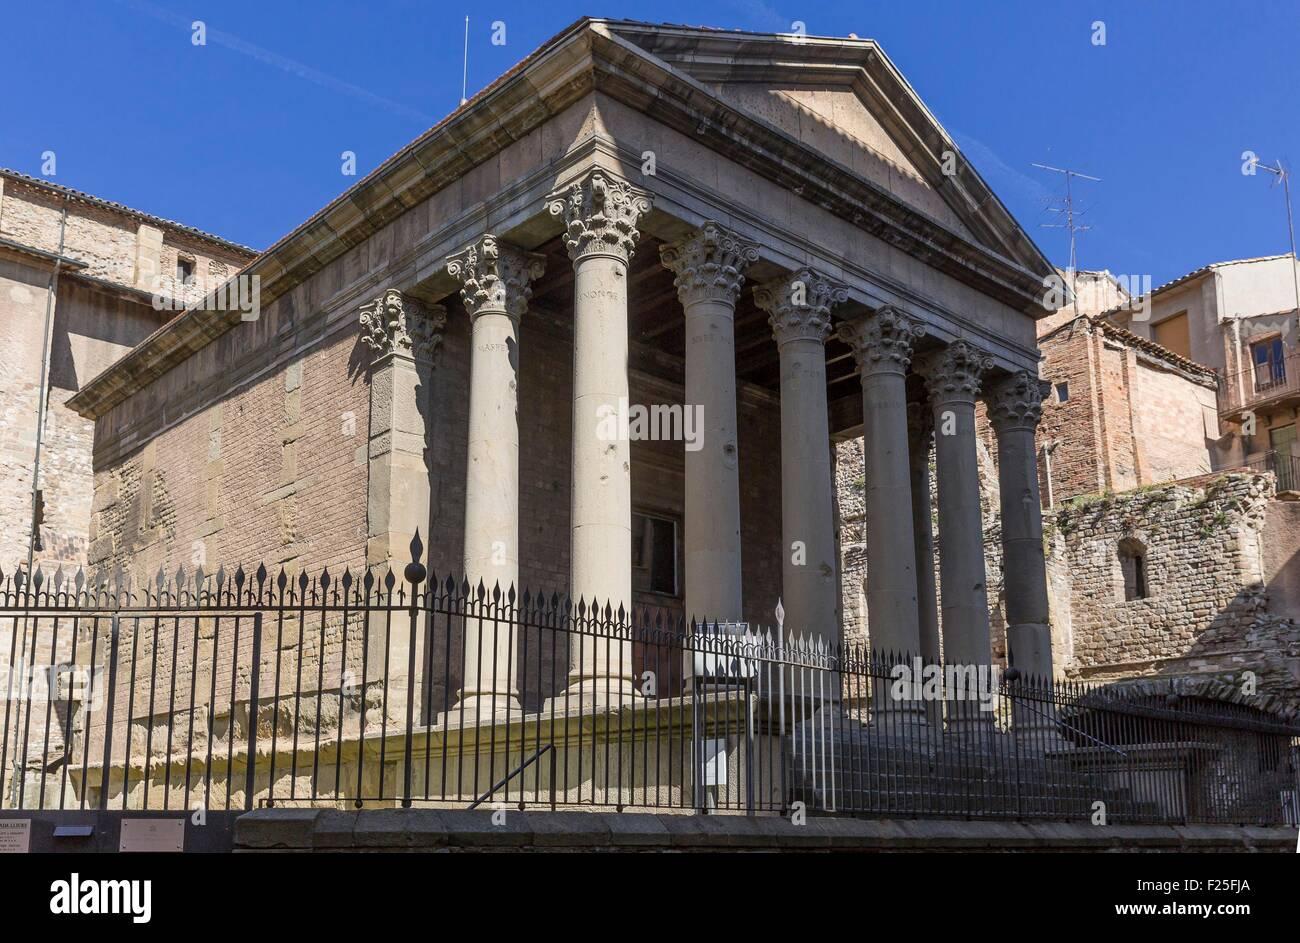 Spain, Catalonia, Vic, roman temple - Stock Image